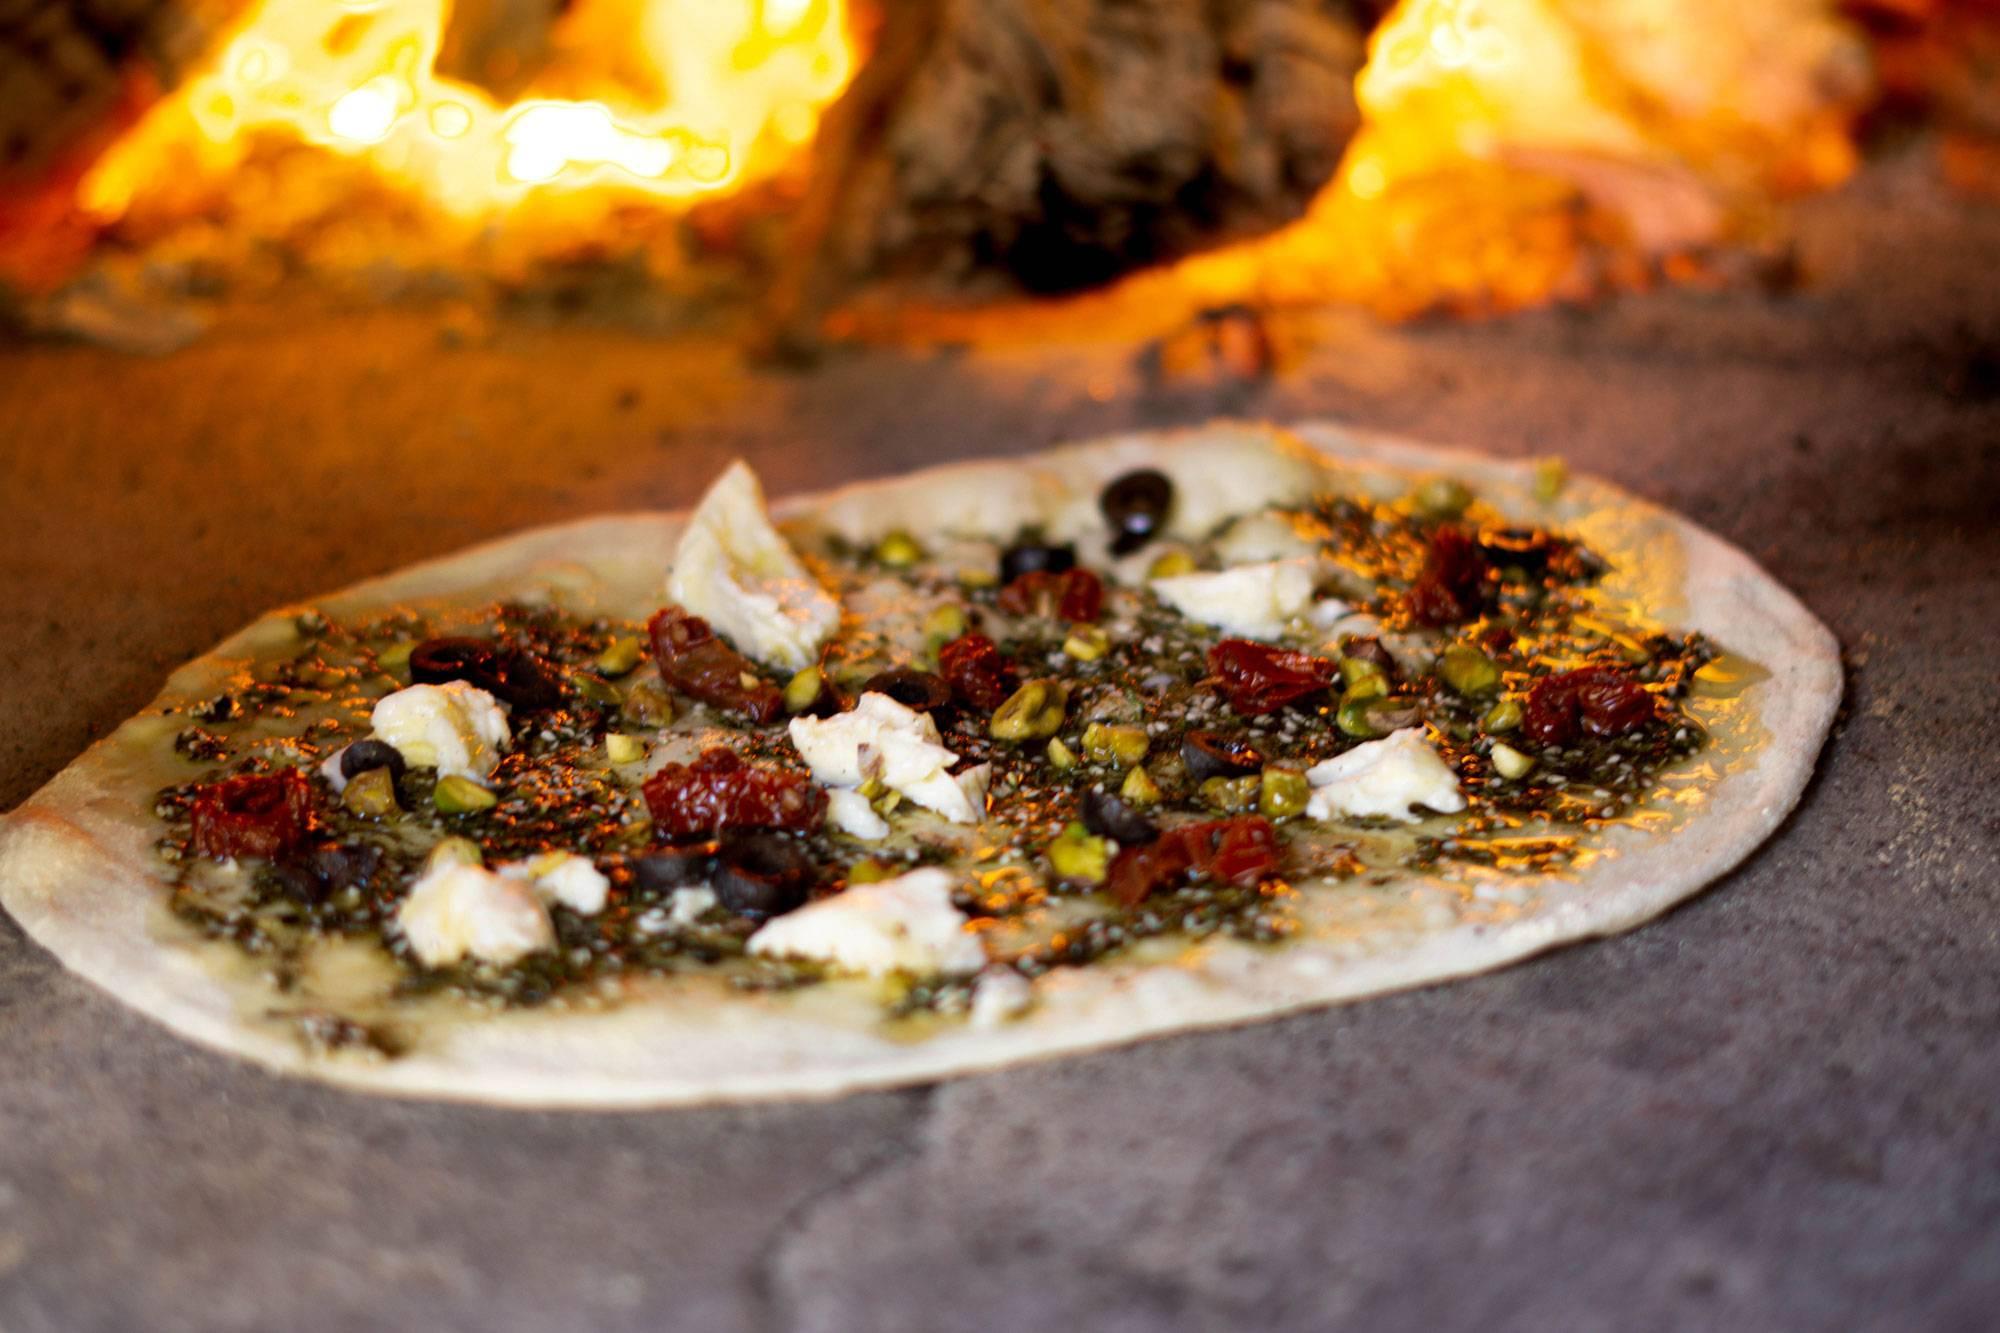 https://www.soulandsurf.com/wp-content/uploads/2021/07/retreatsportugal-images@joeliooo_Food_Pizza_1.jpg